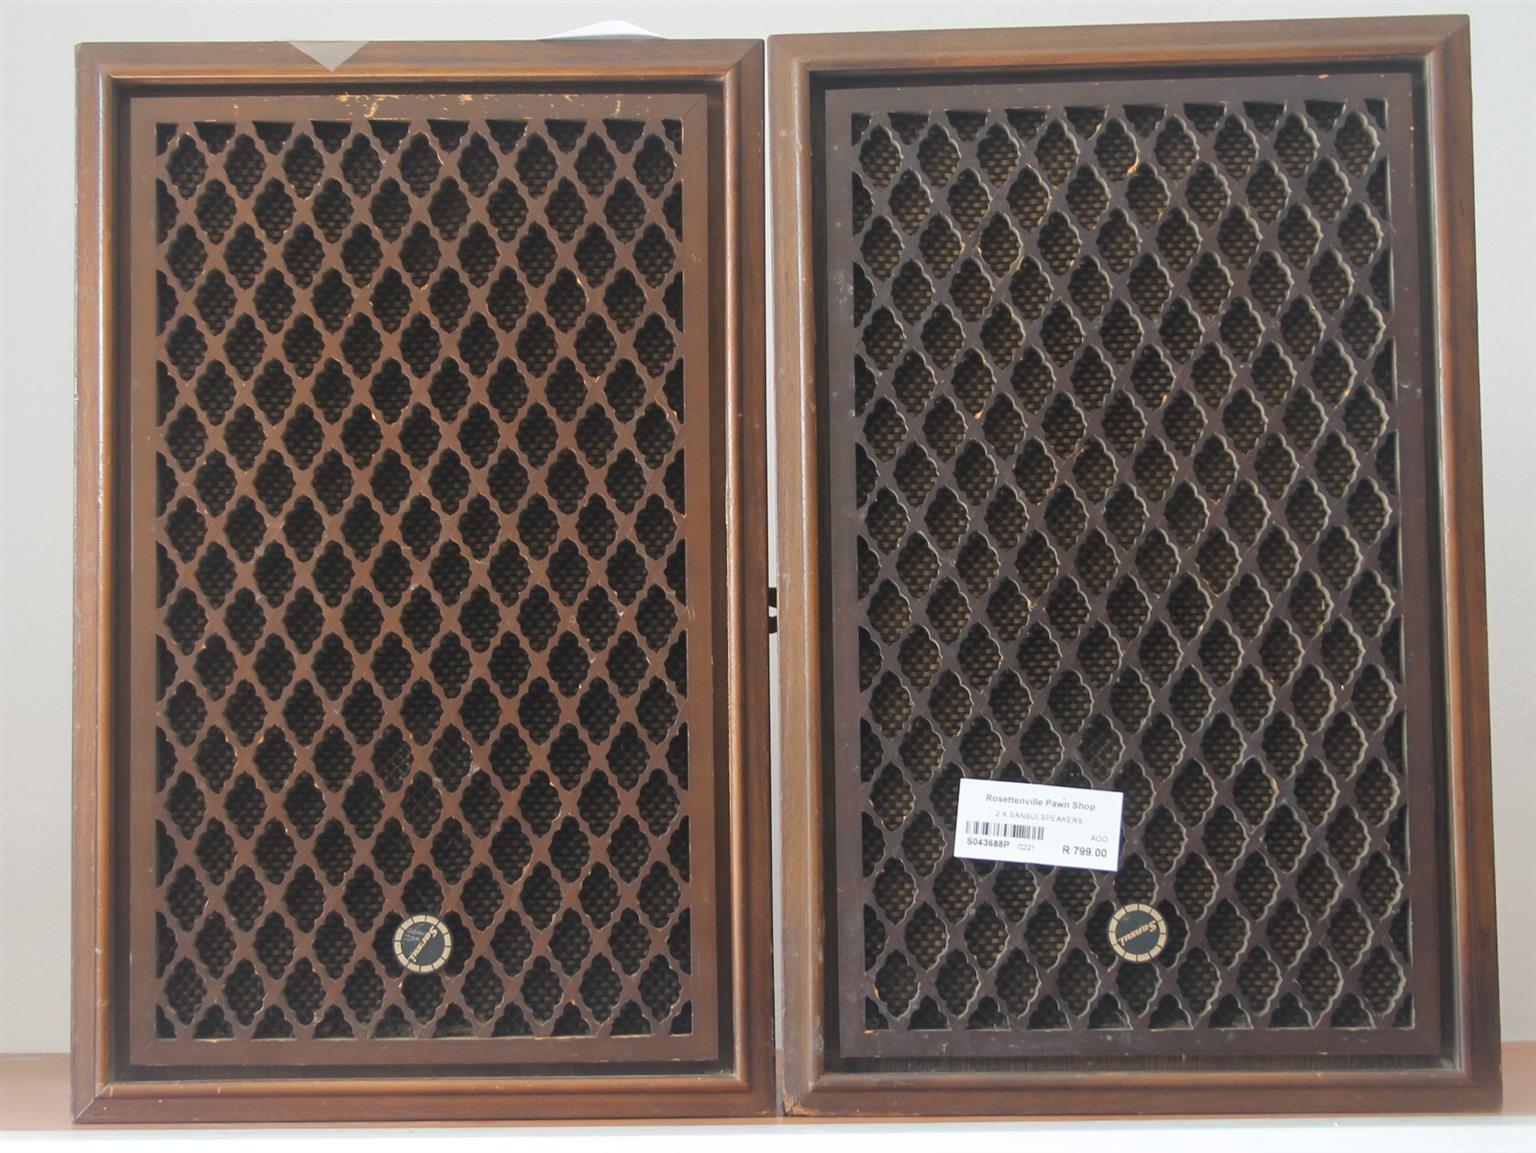 2X sansui speakers S043688P #Rosettenvillepawnshop